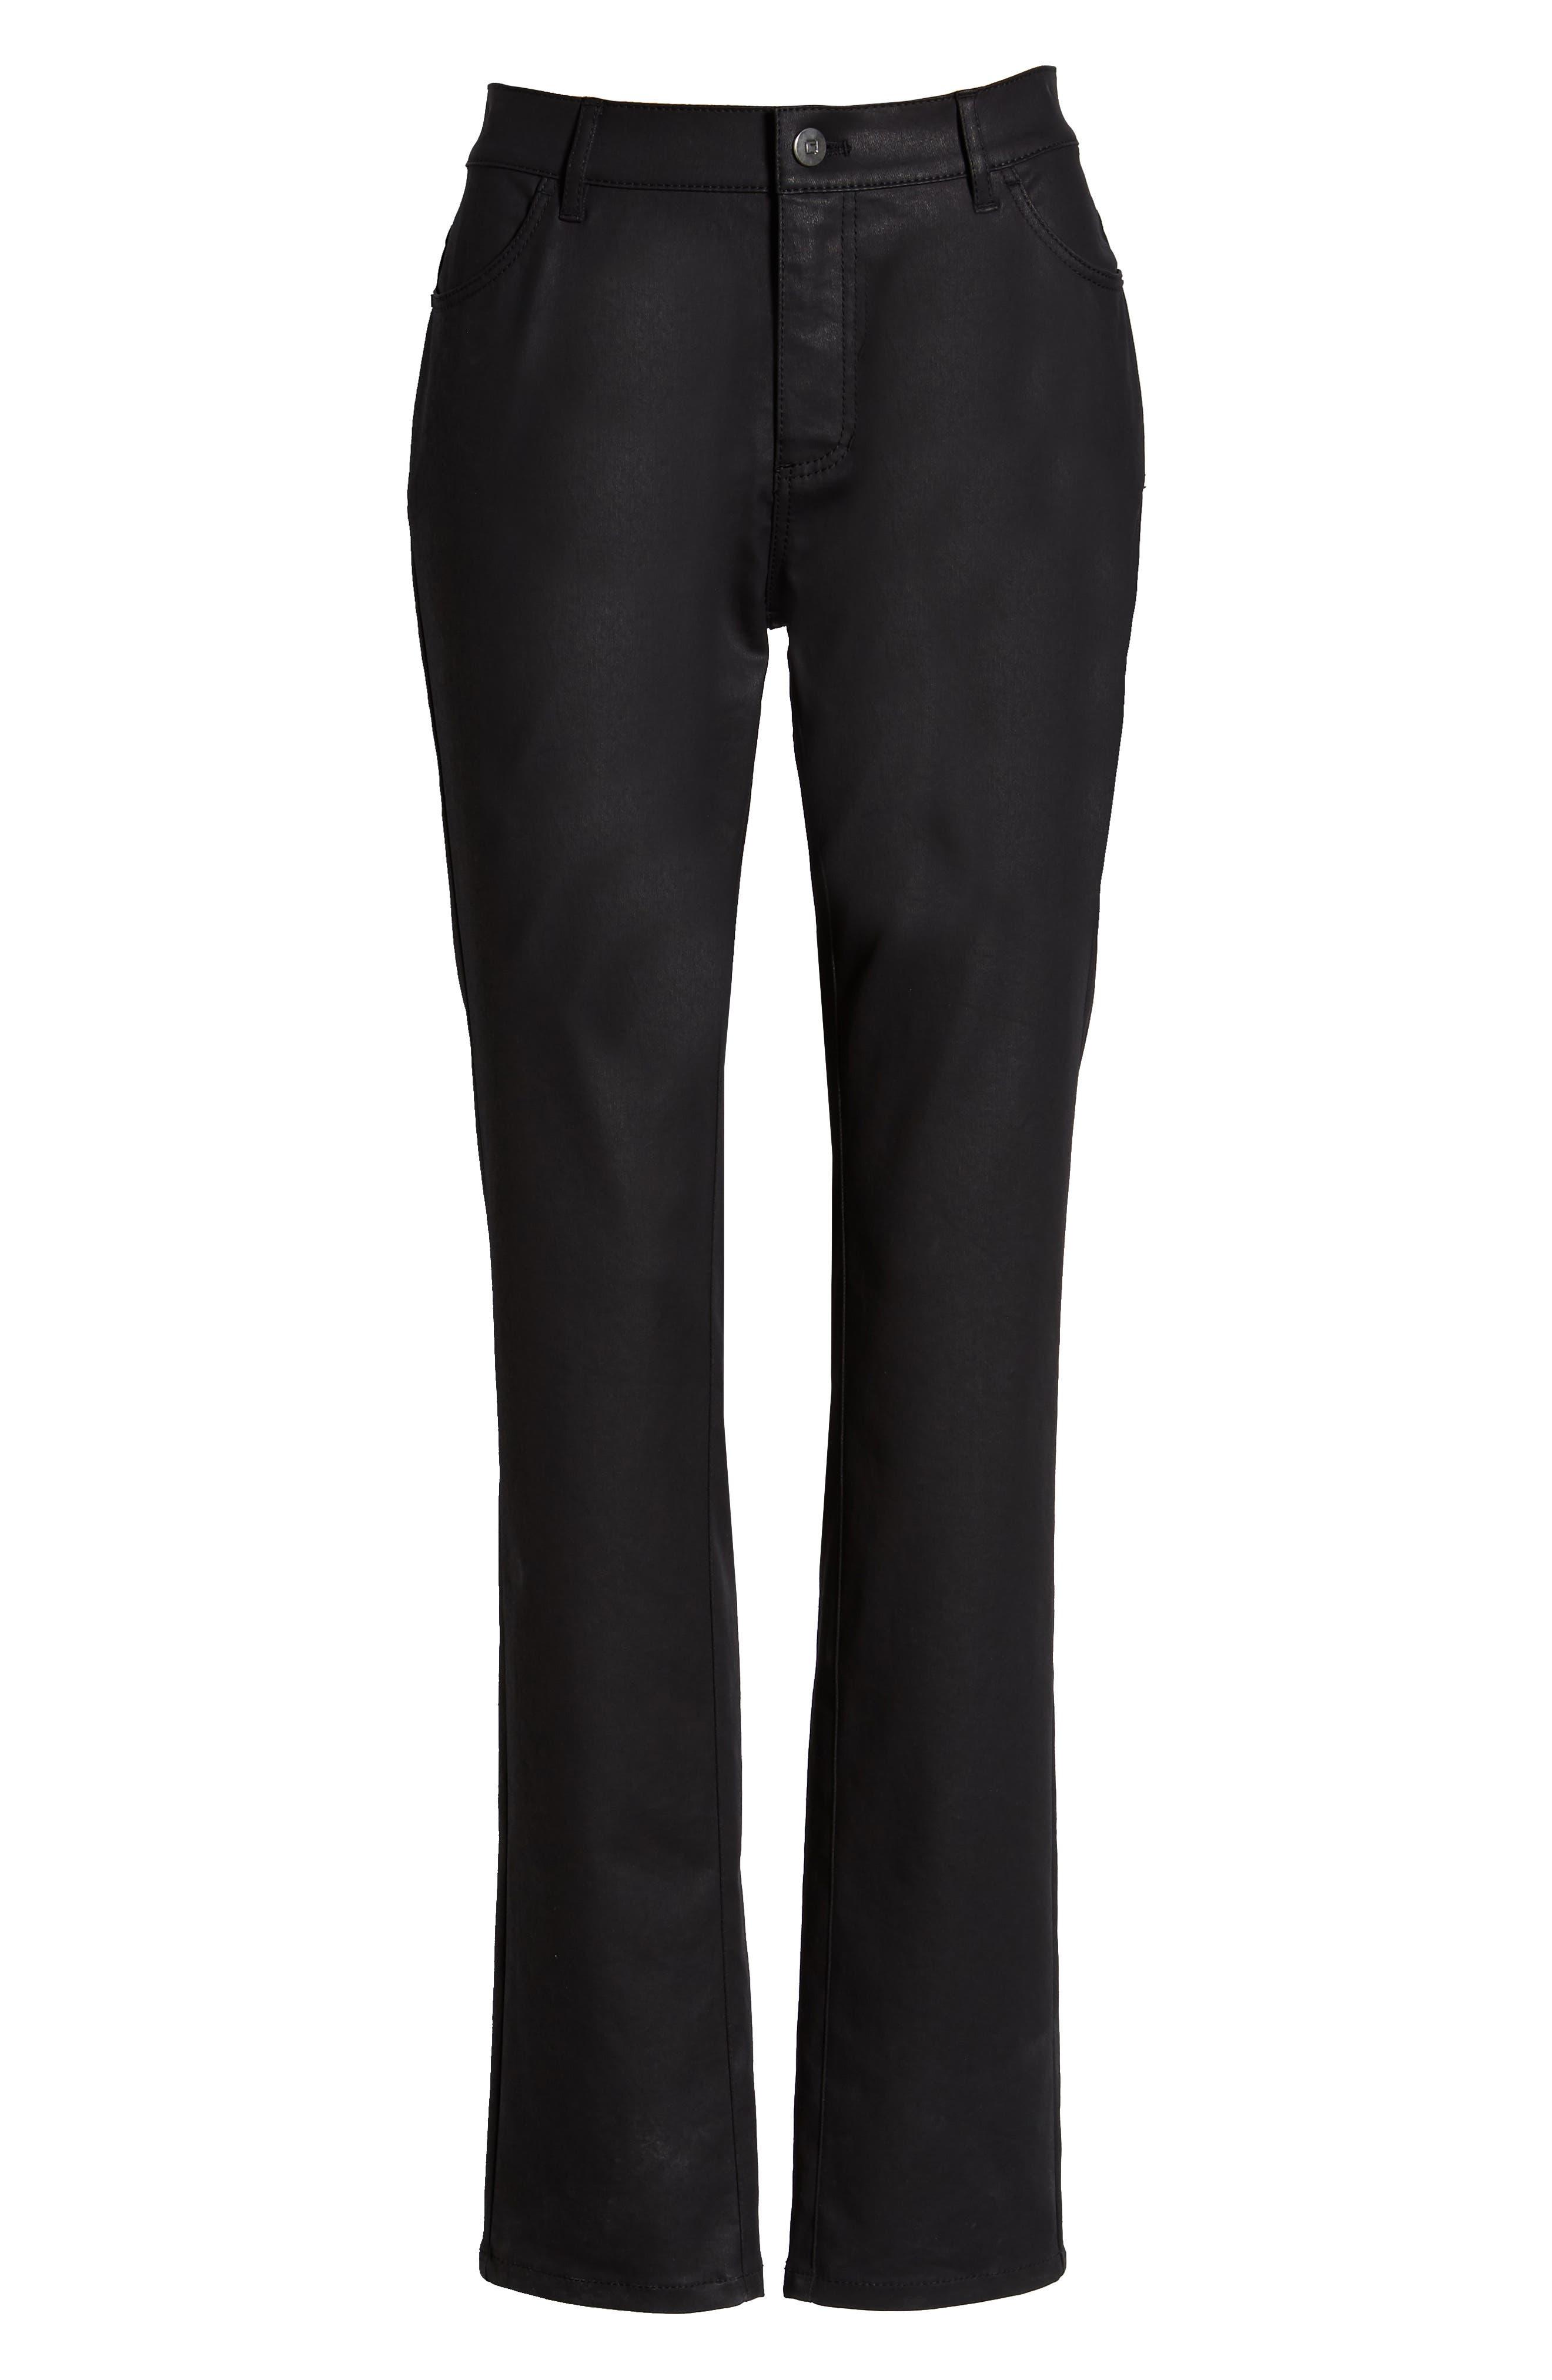 LAFAYETTE 148 NEW YORK, Waxed Denim Slim Leg Jeans, Alternate thumbnail 2, color, INK